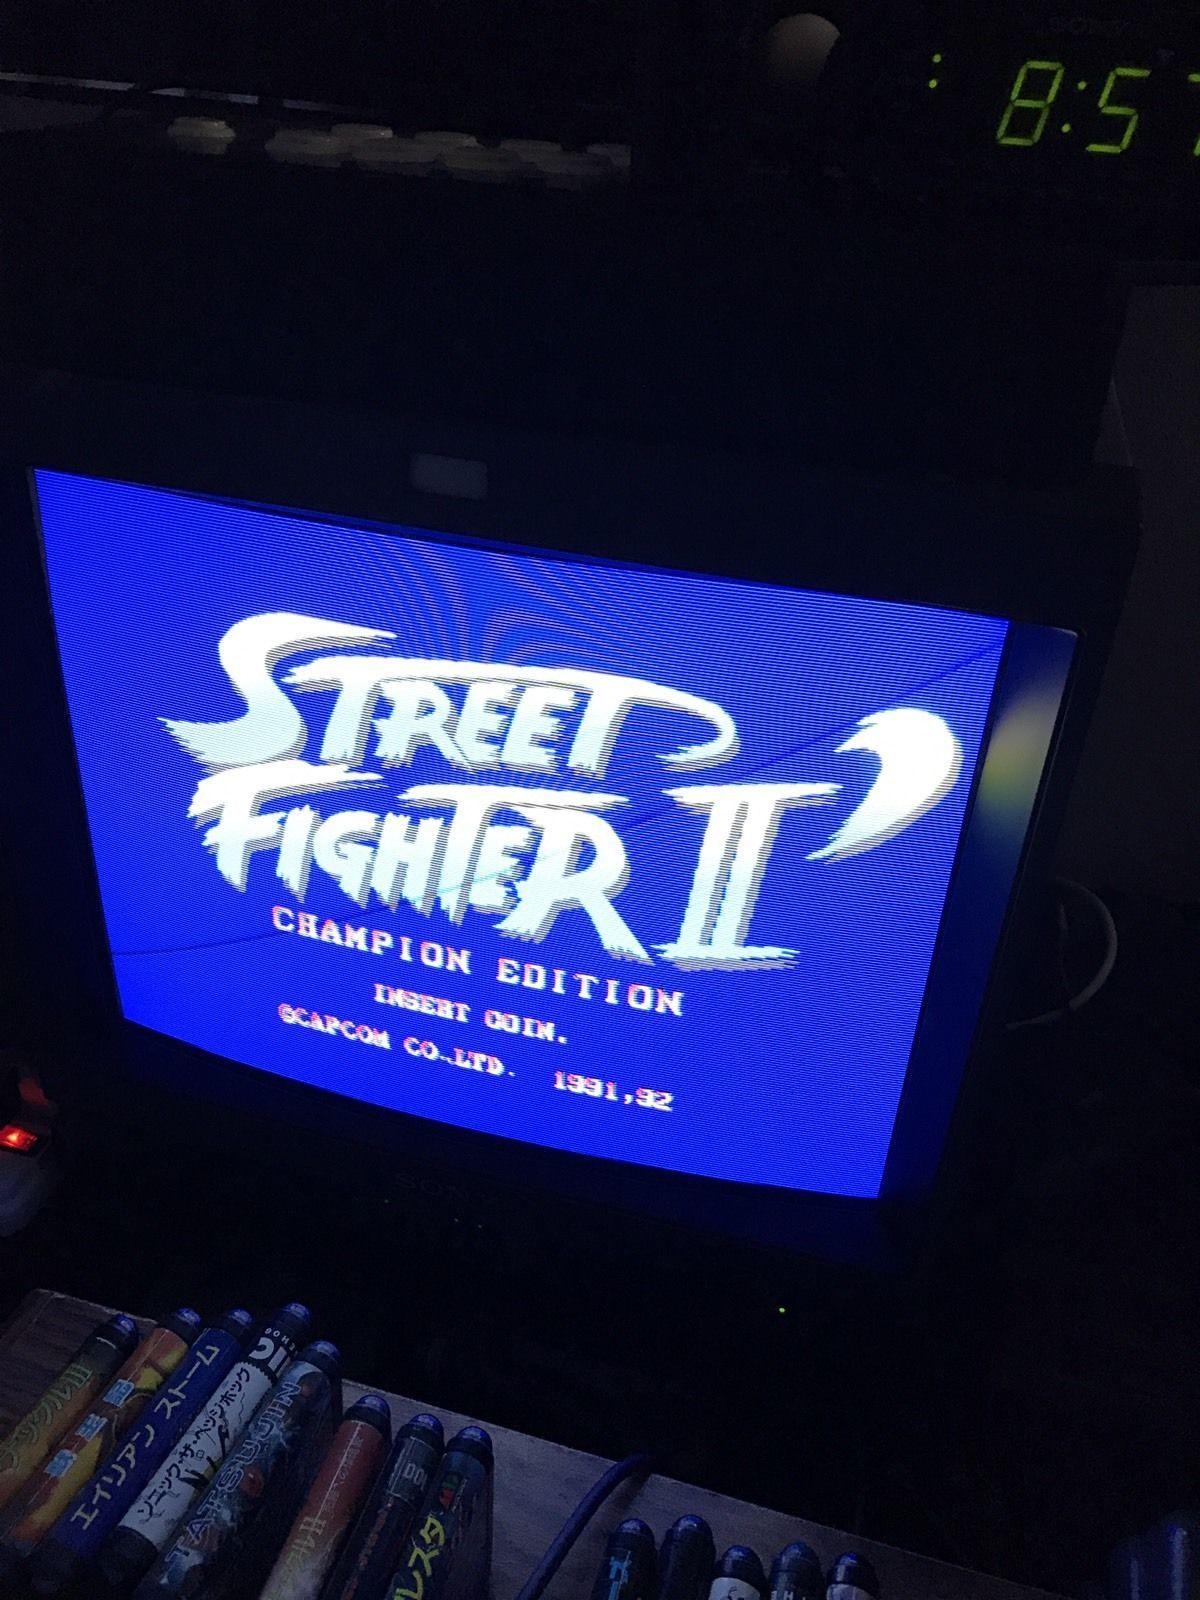 Street Fighter 2 Champion Edition Jamma Pcb Tested Street Fighter 2 Street Fighter Fighter